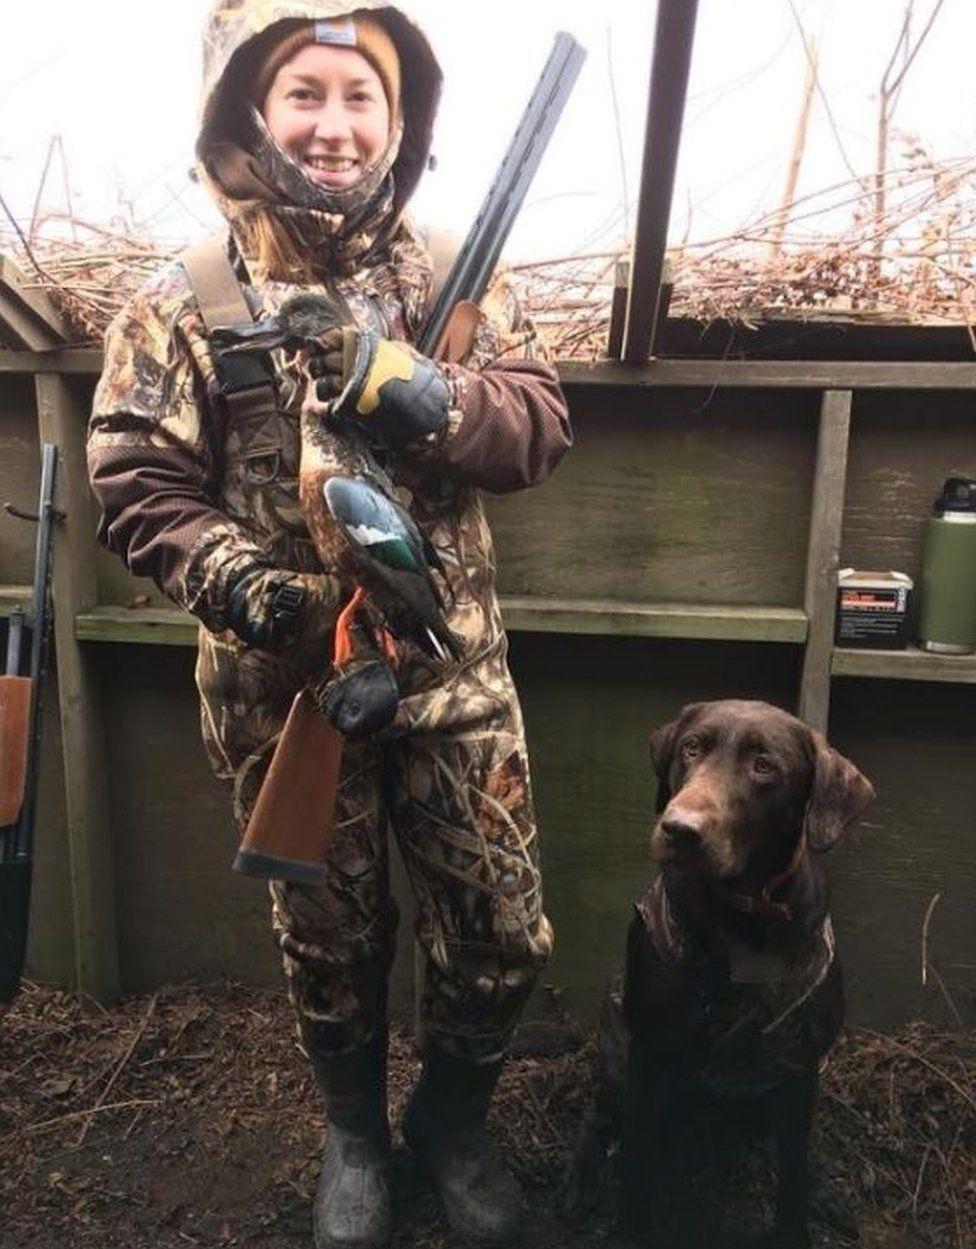 Samantha Pedder with a duck that she shot